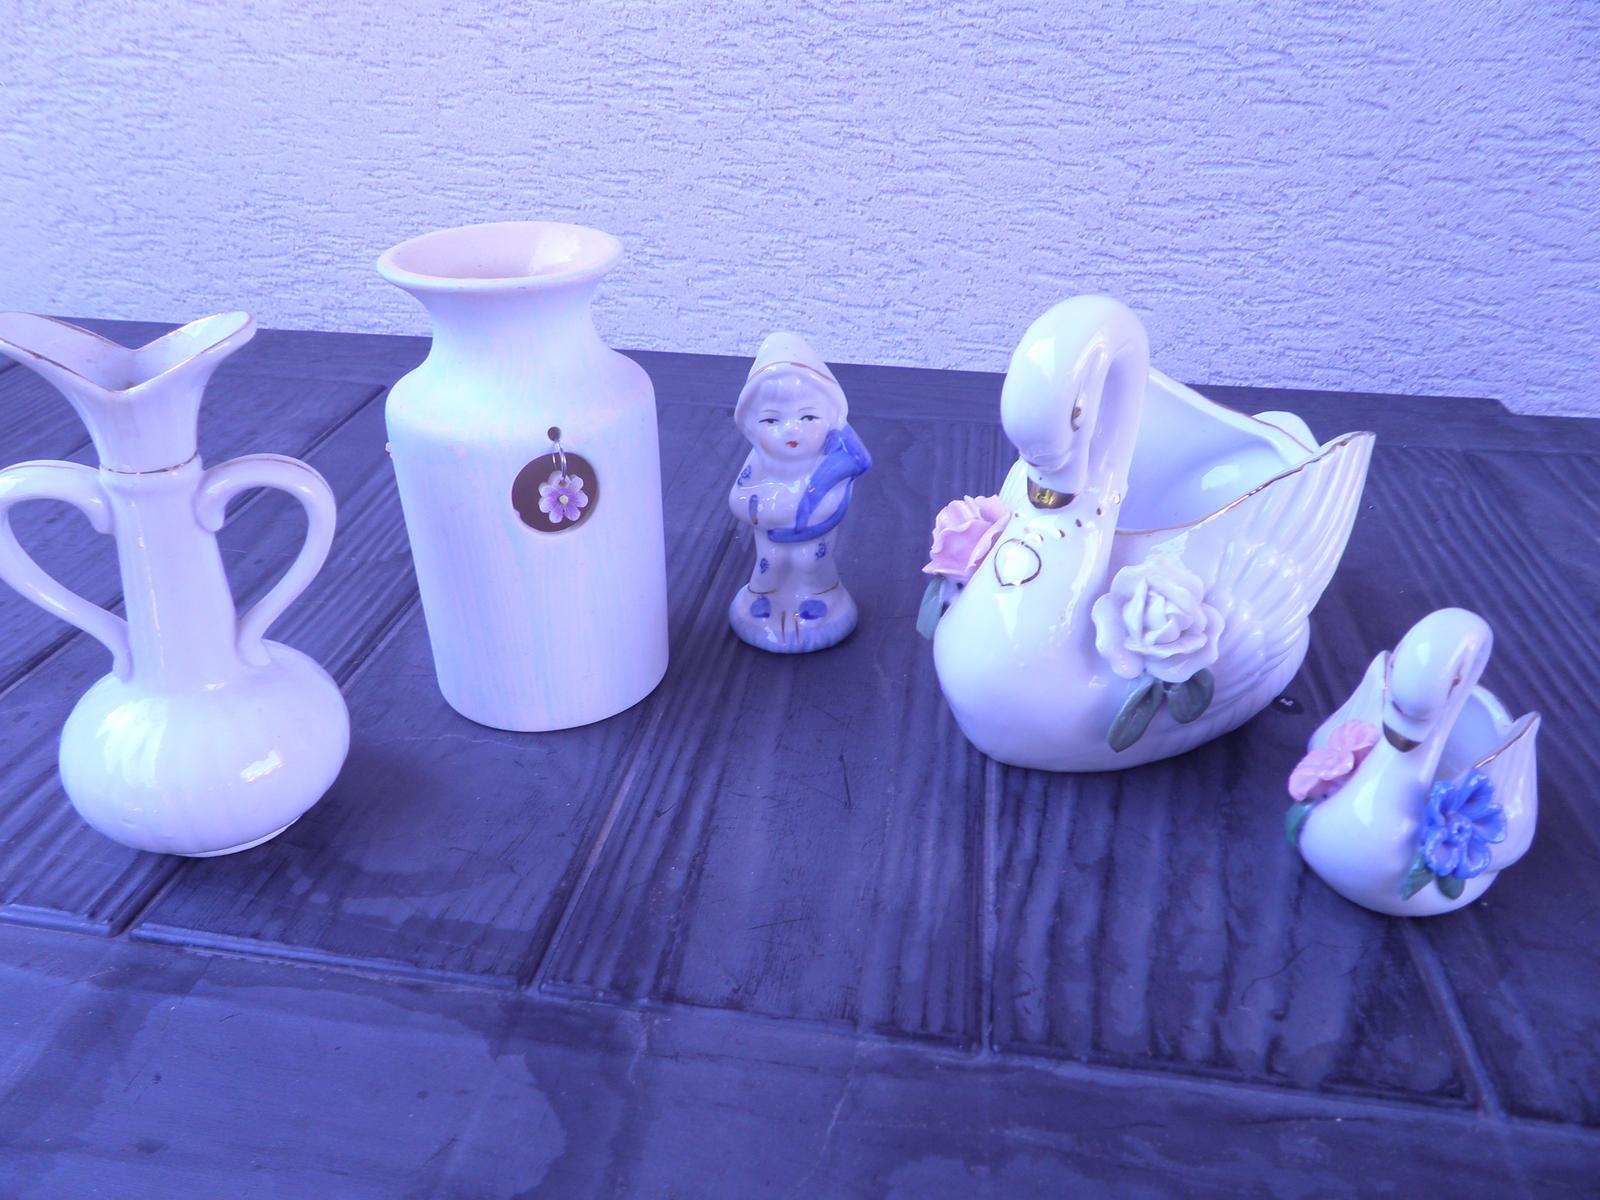 biela keramika po 0,50e - Obrázok č. 1